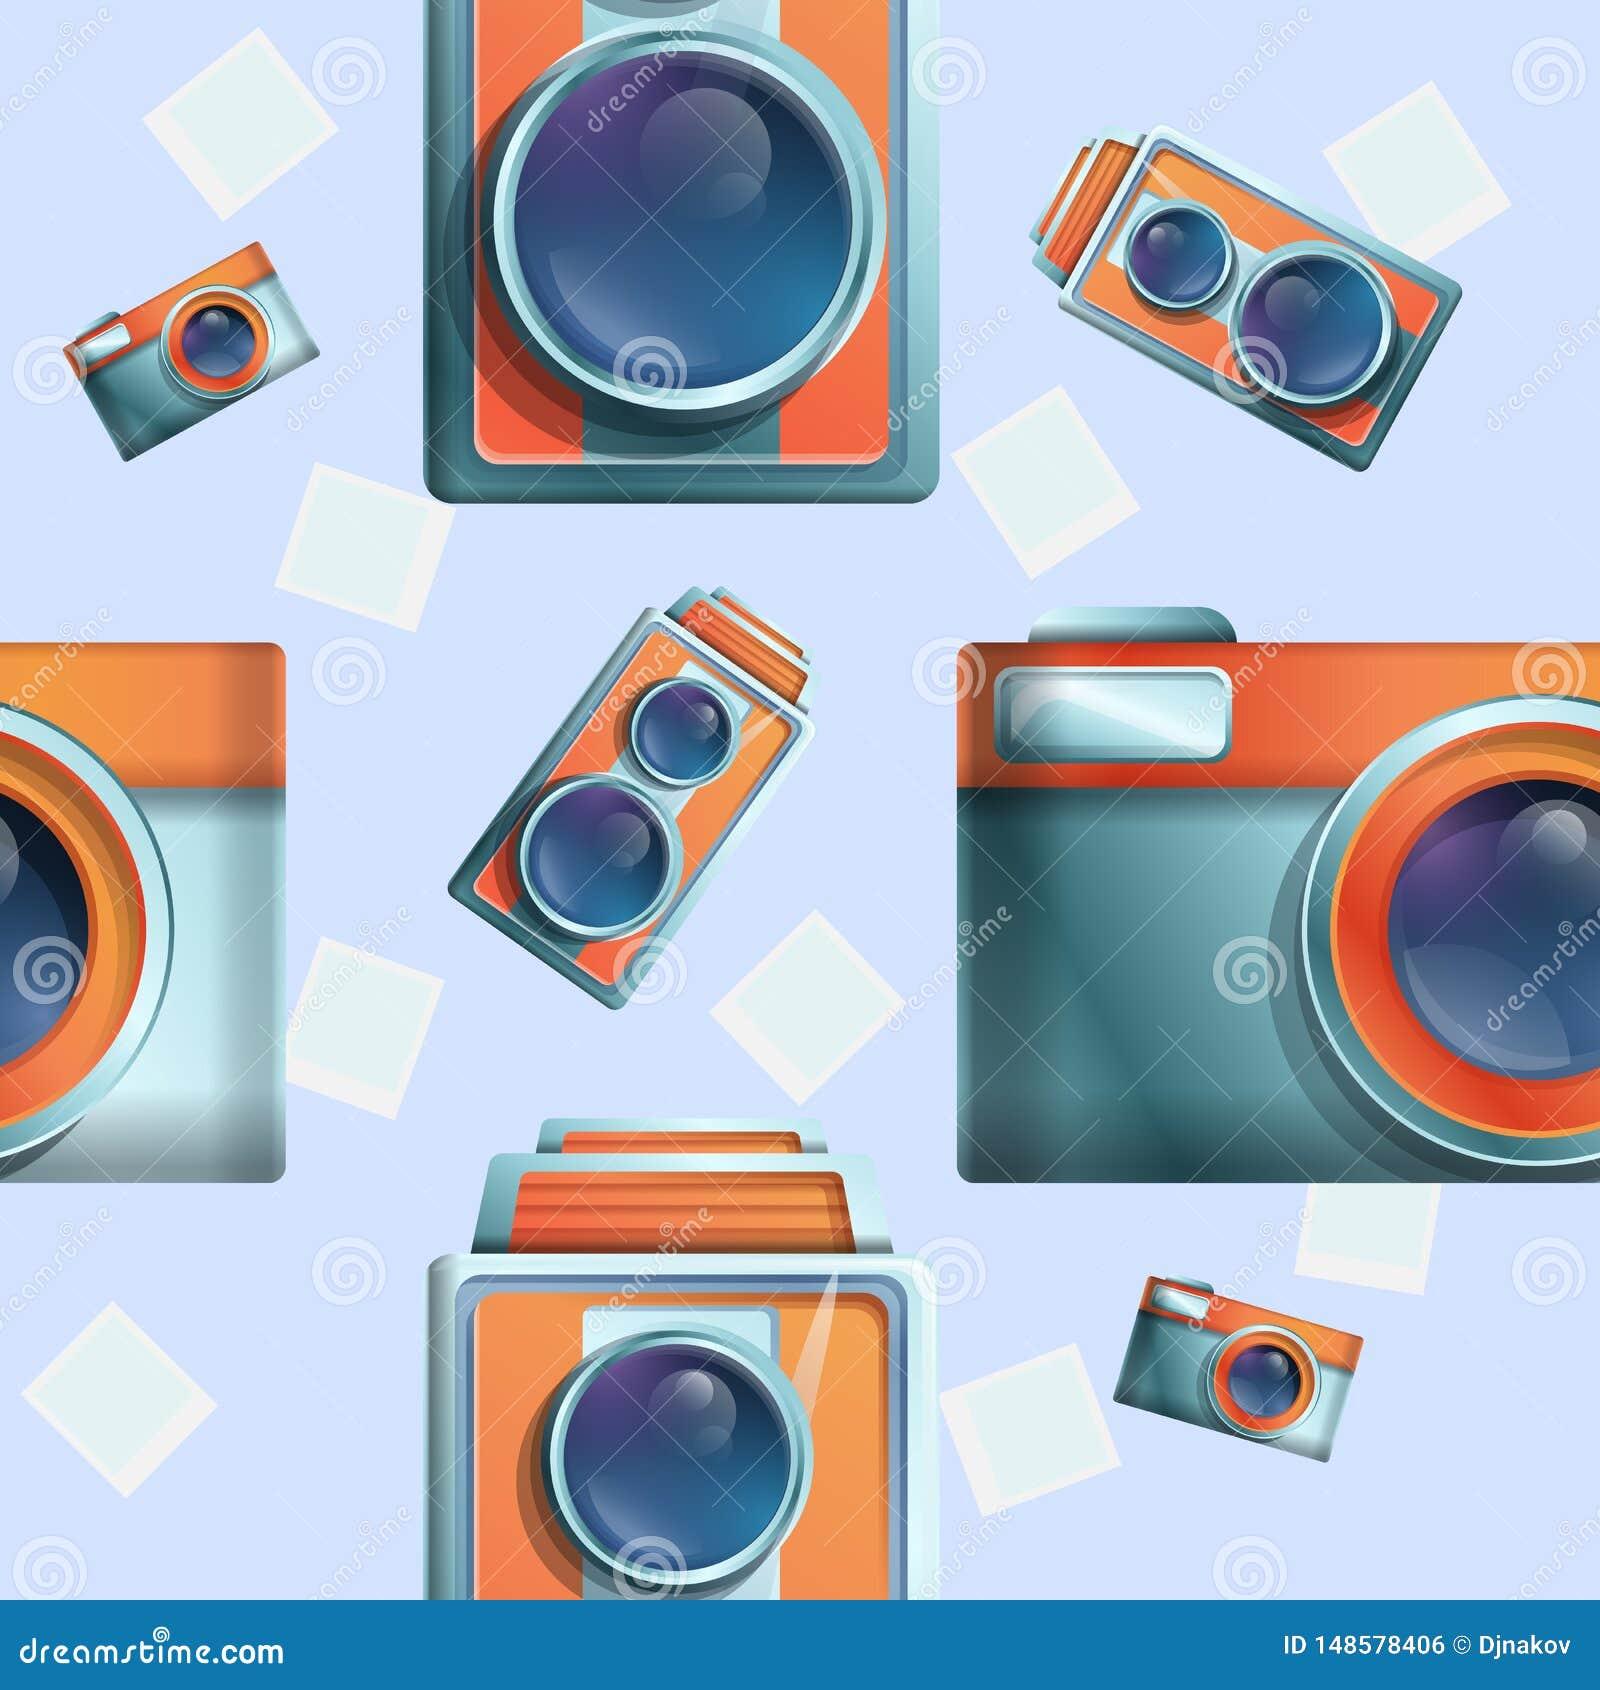 Seamless cartoon phot on the theme of vintage cameras